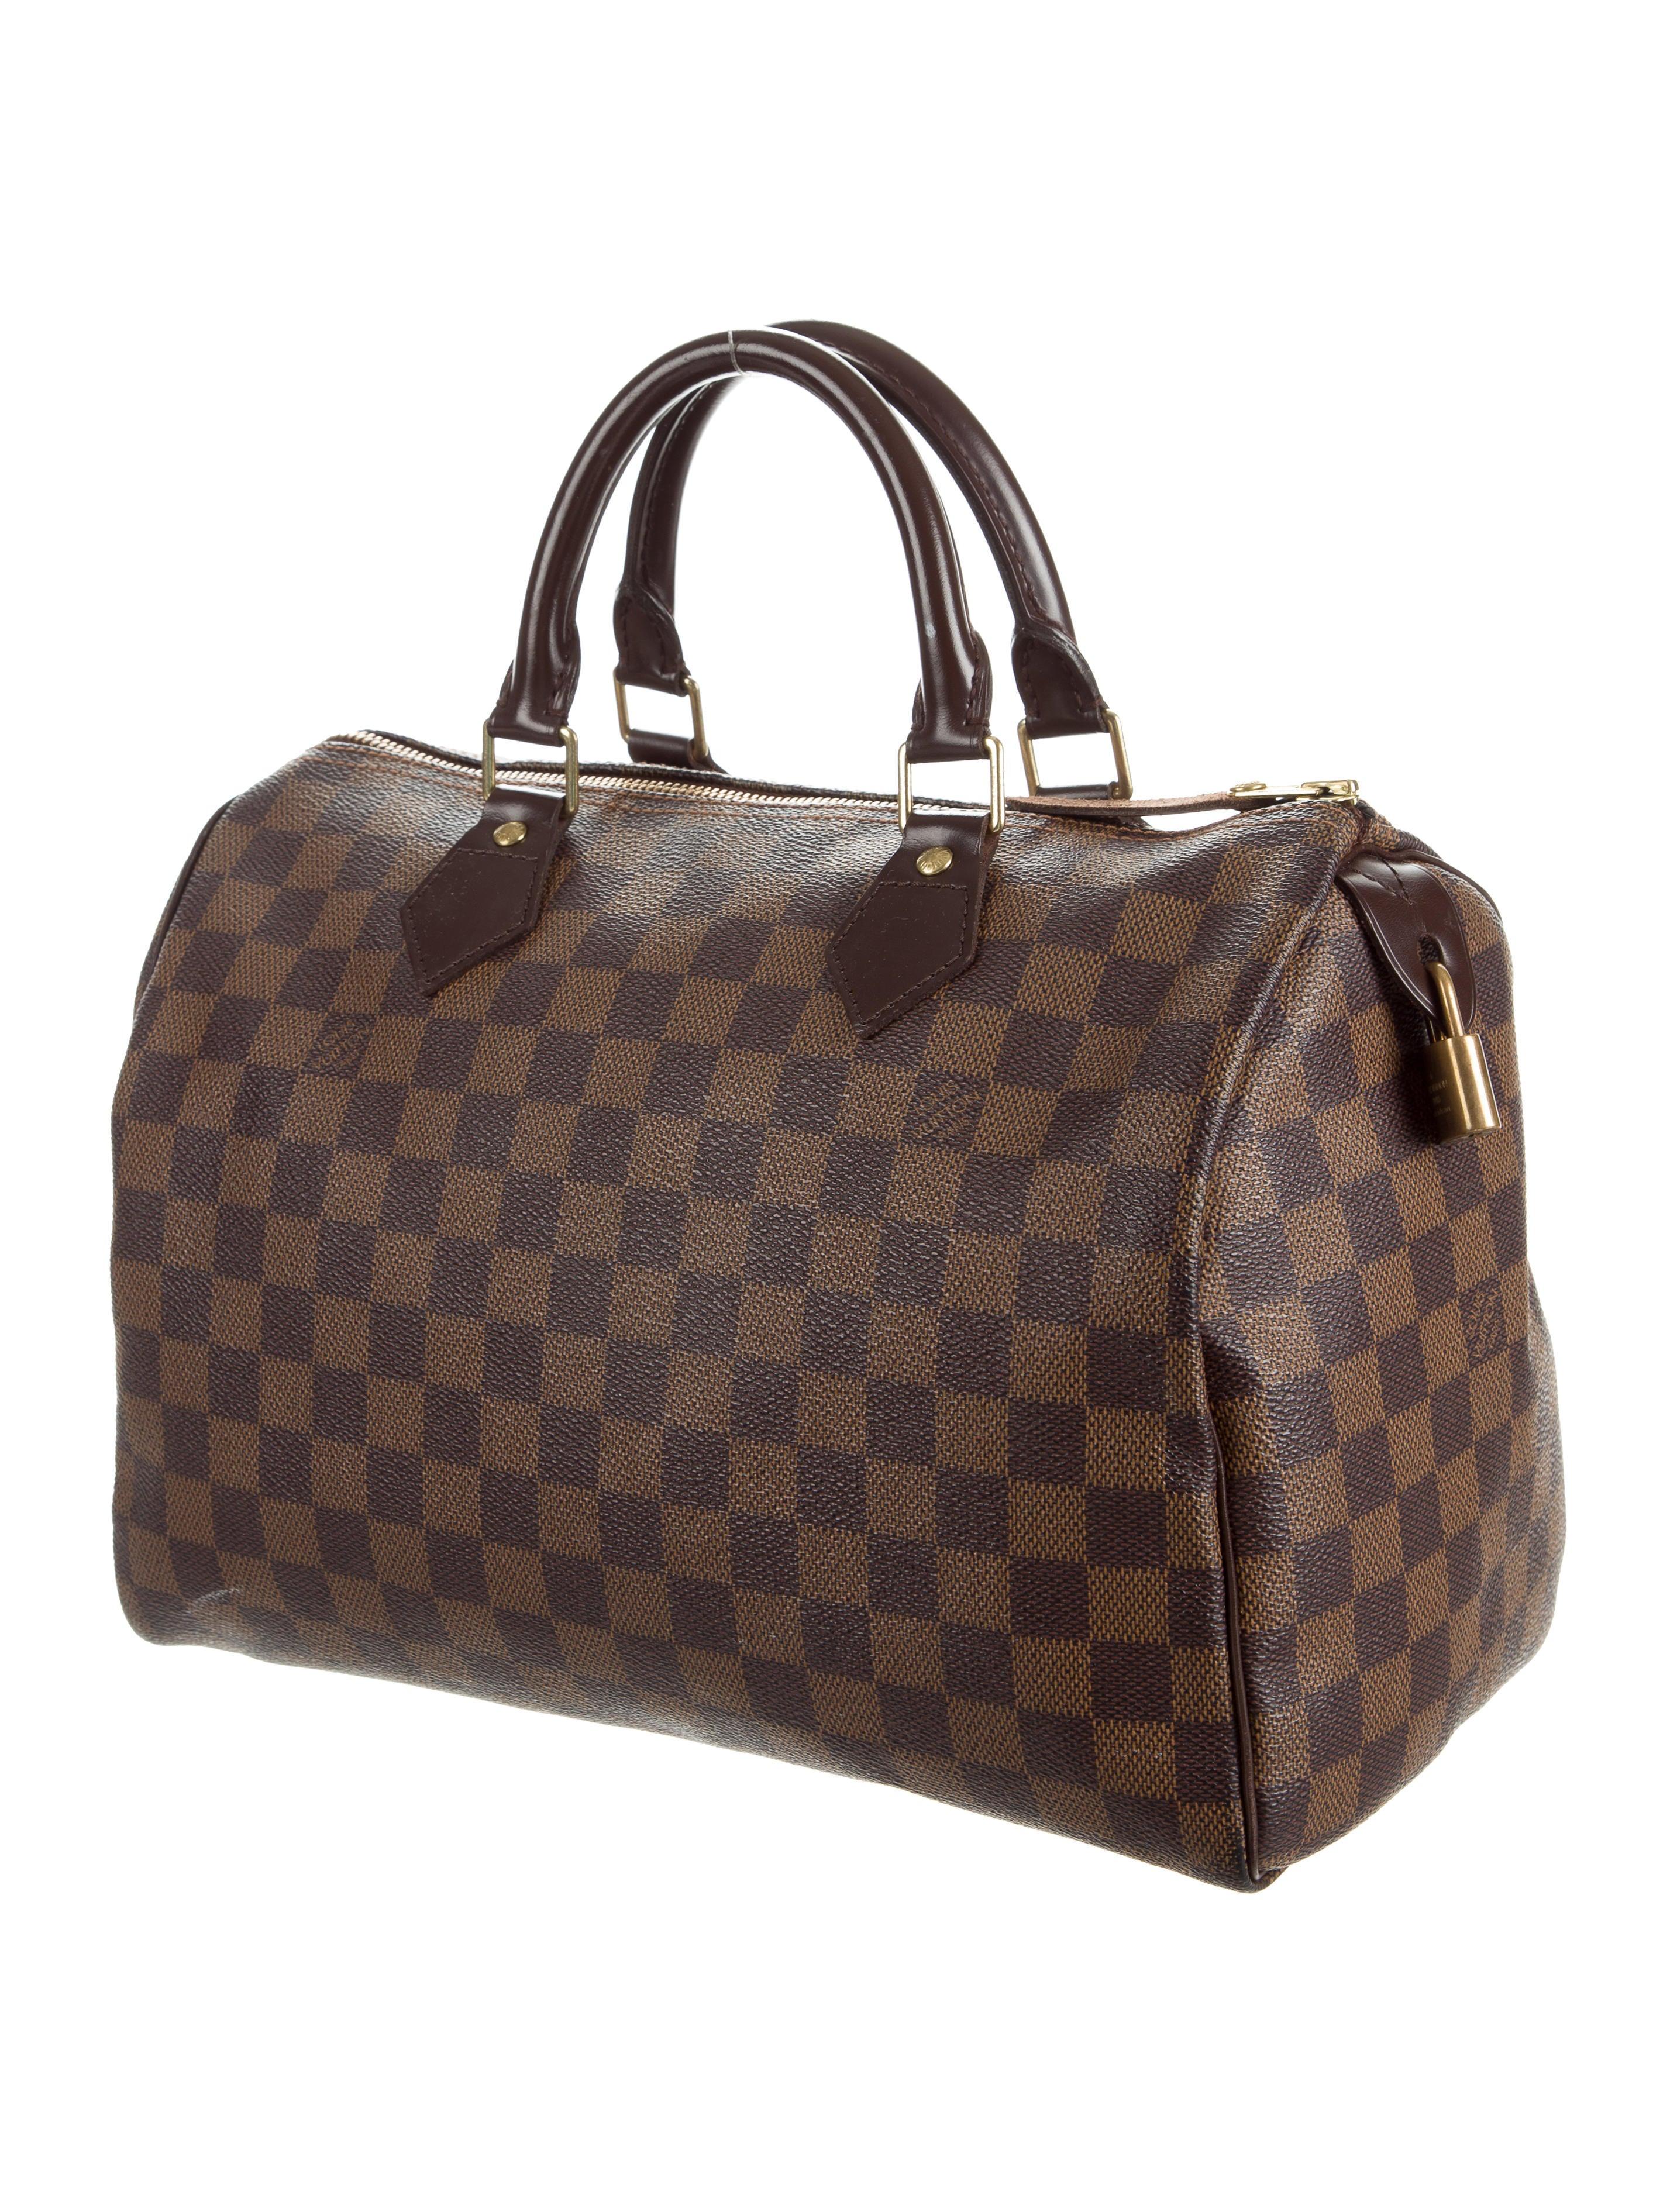 louis vuitton damier ebene speedy 30 handbags lou116121 the realreal. Black Bedroom Furniture Sets. Home Design Ideas